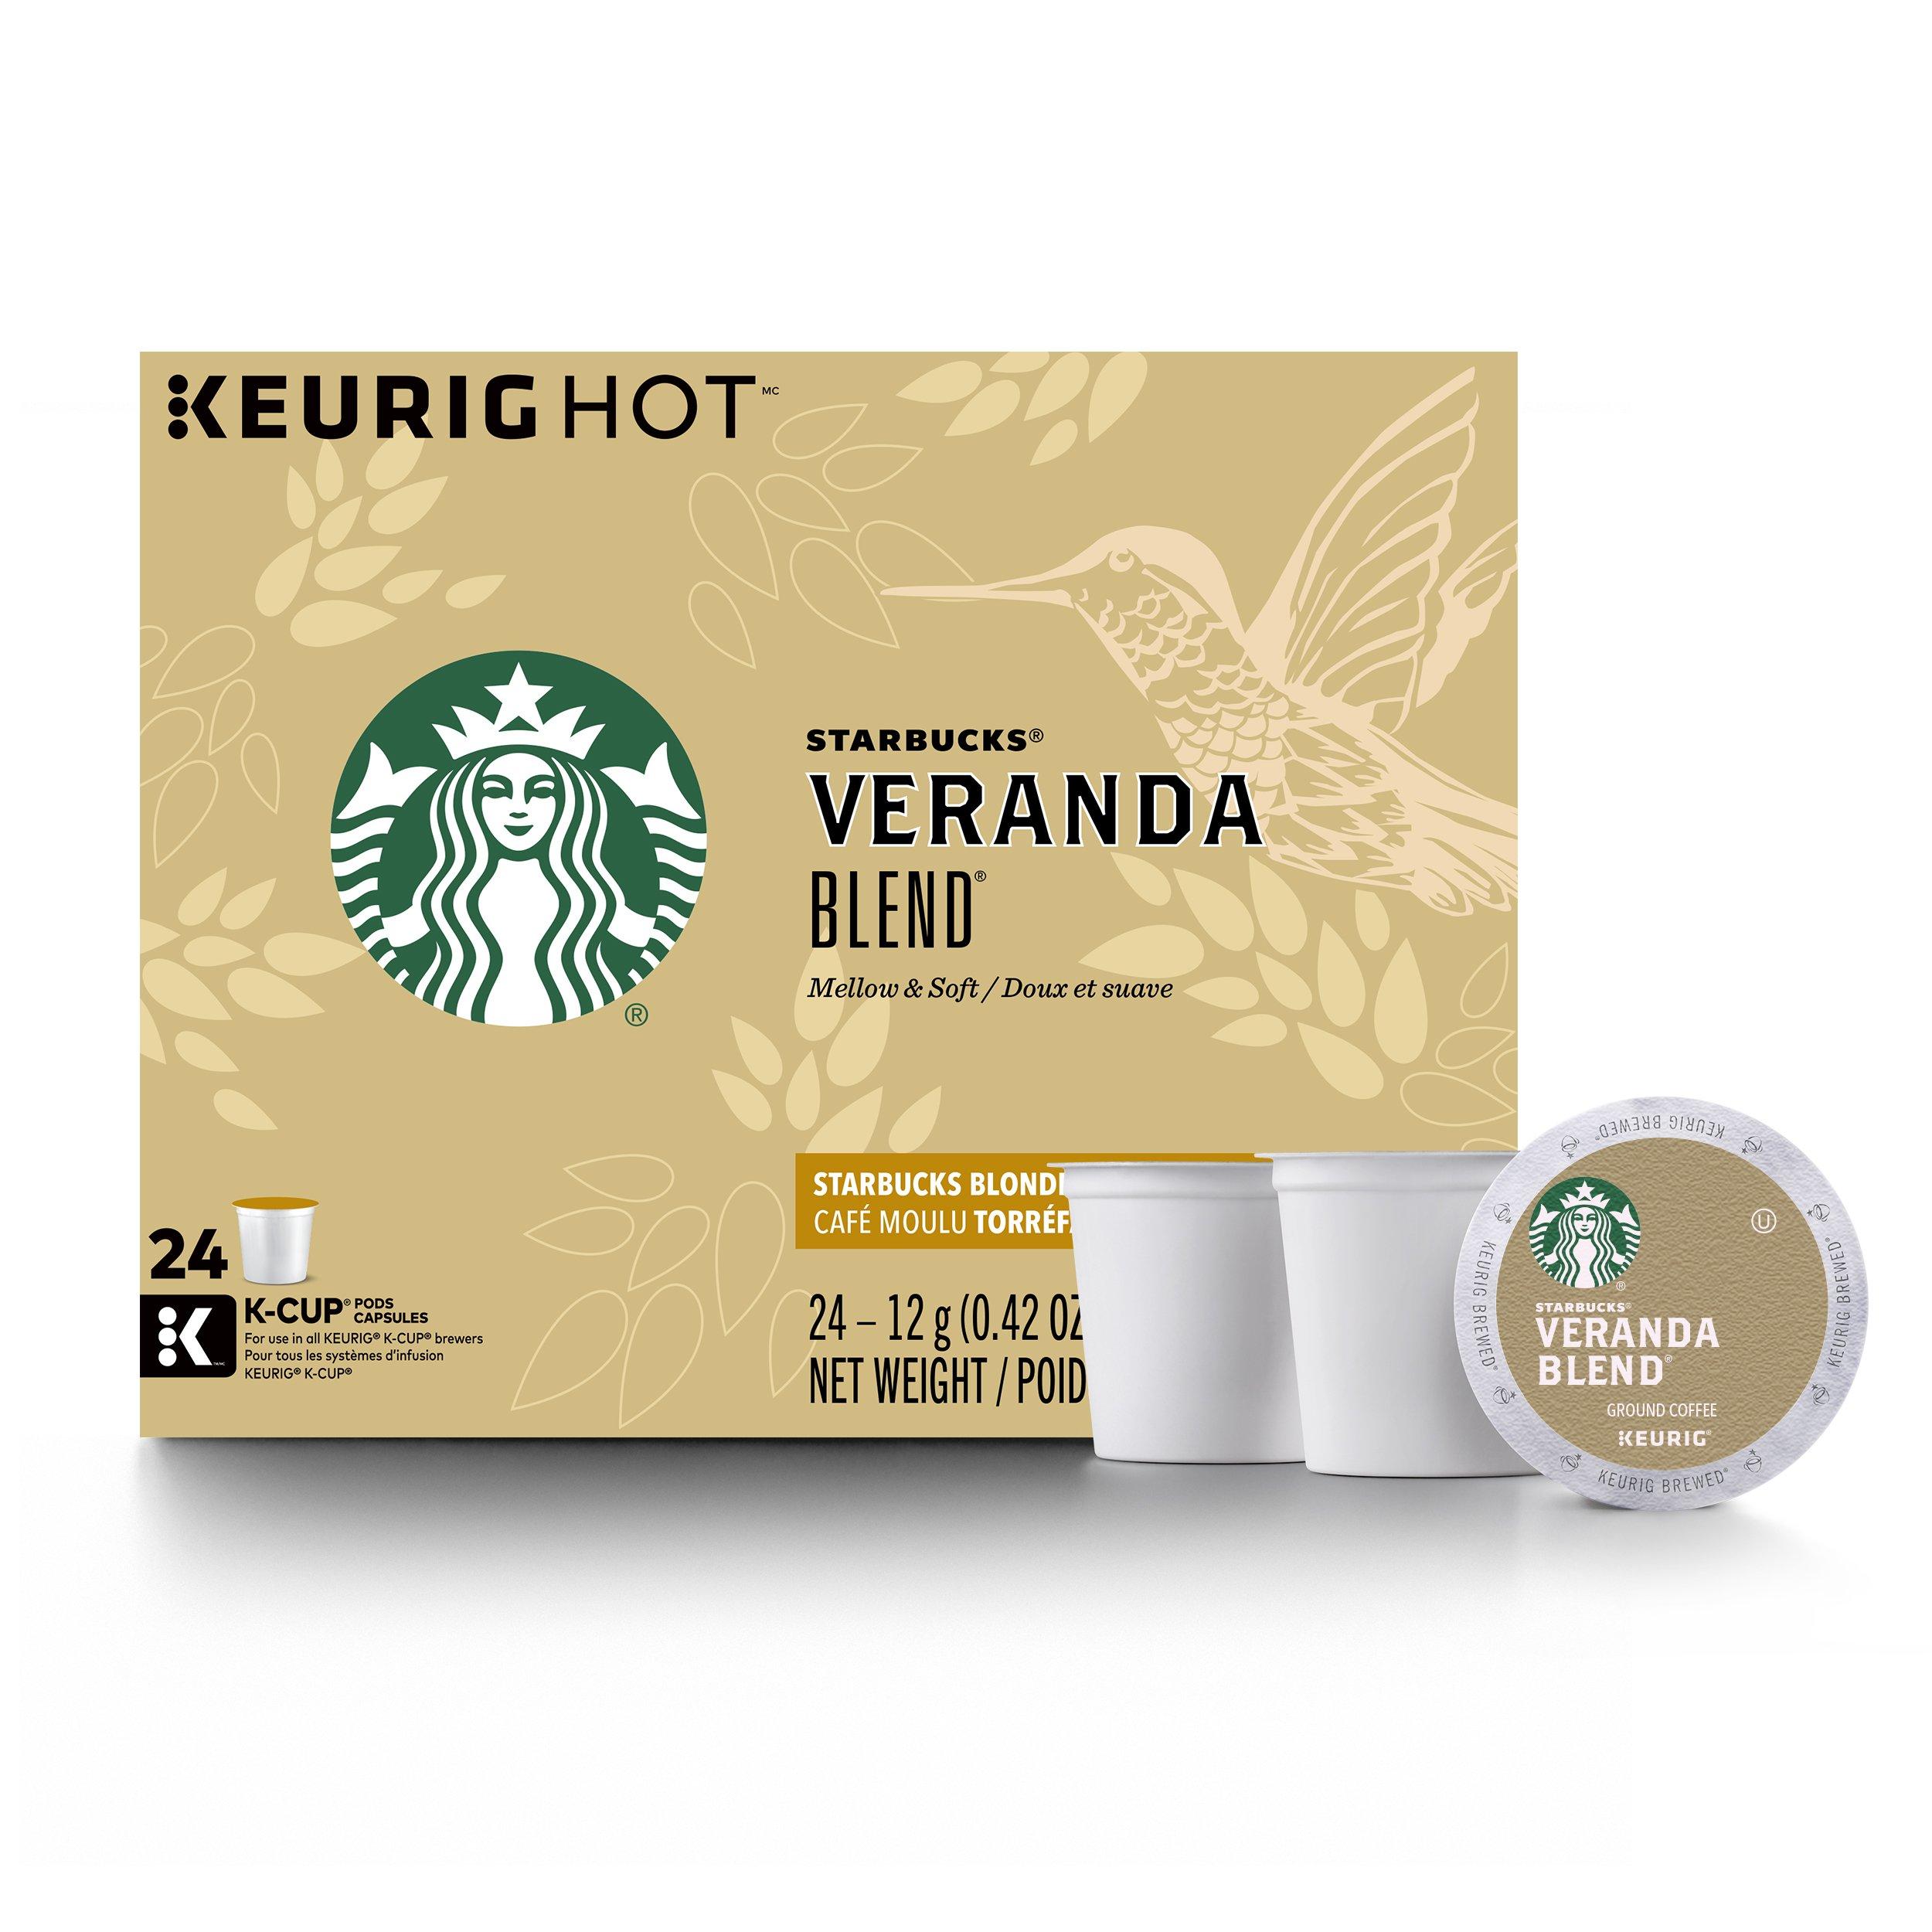 Starbucks Veranda Blend Blonde Light Roast Single Cup Coffee for Keurig Brewers, 4 Boxes of 24 (96 Total K-Cup pods)